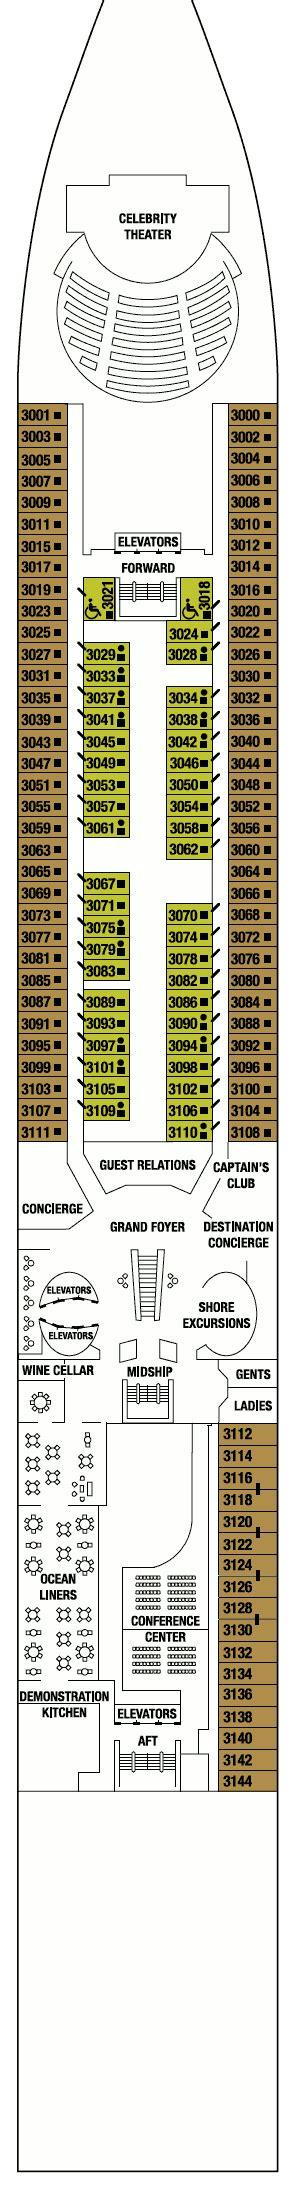 constellation deck plan 8 constellation deck plans